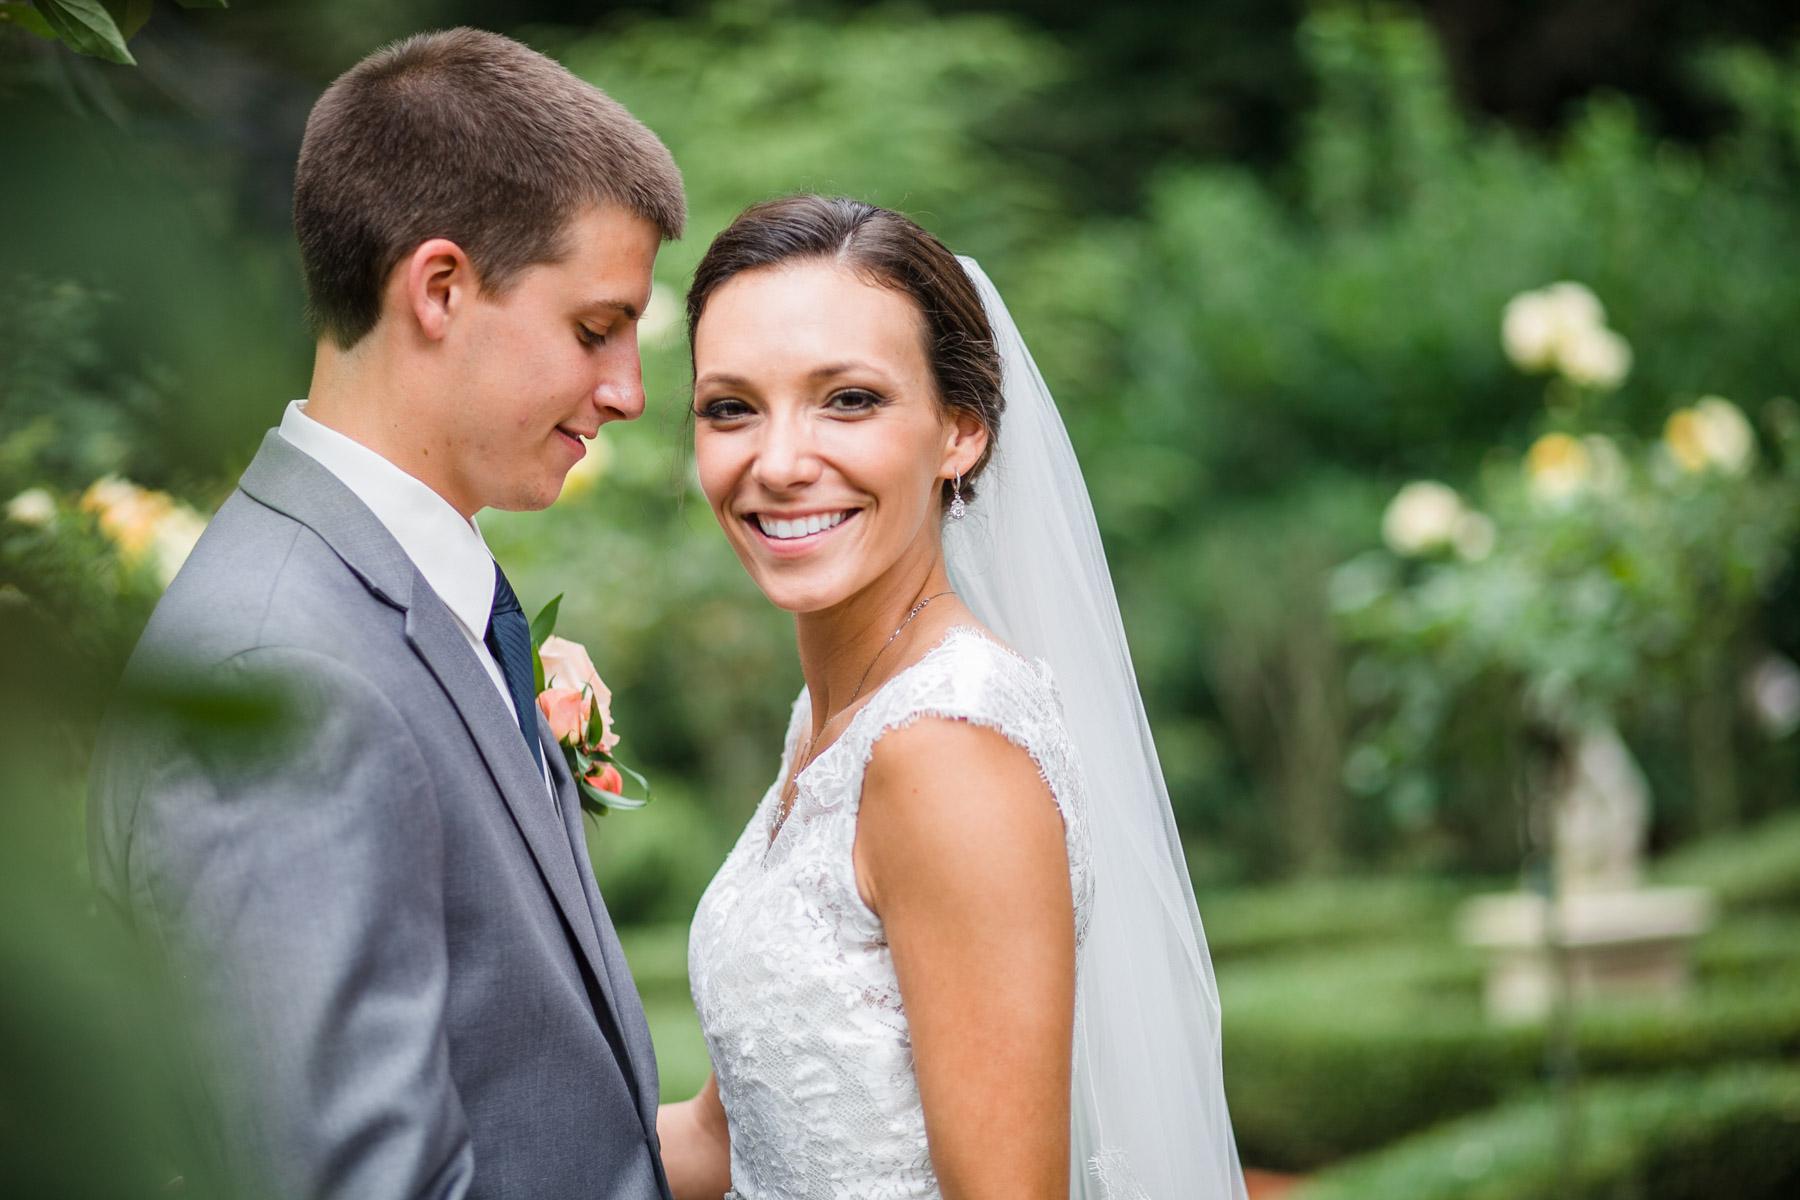 wildwood-park-wedding-photos-52.jpg